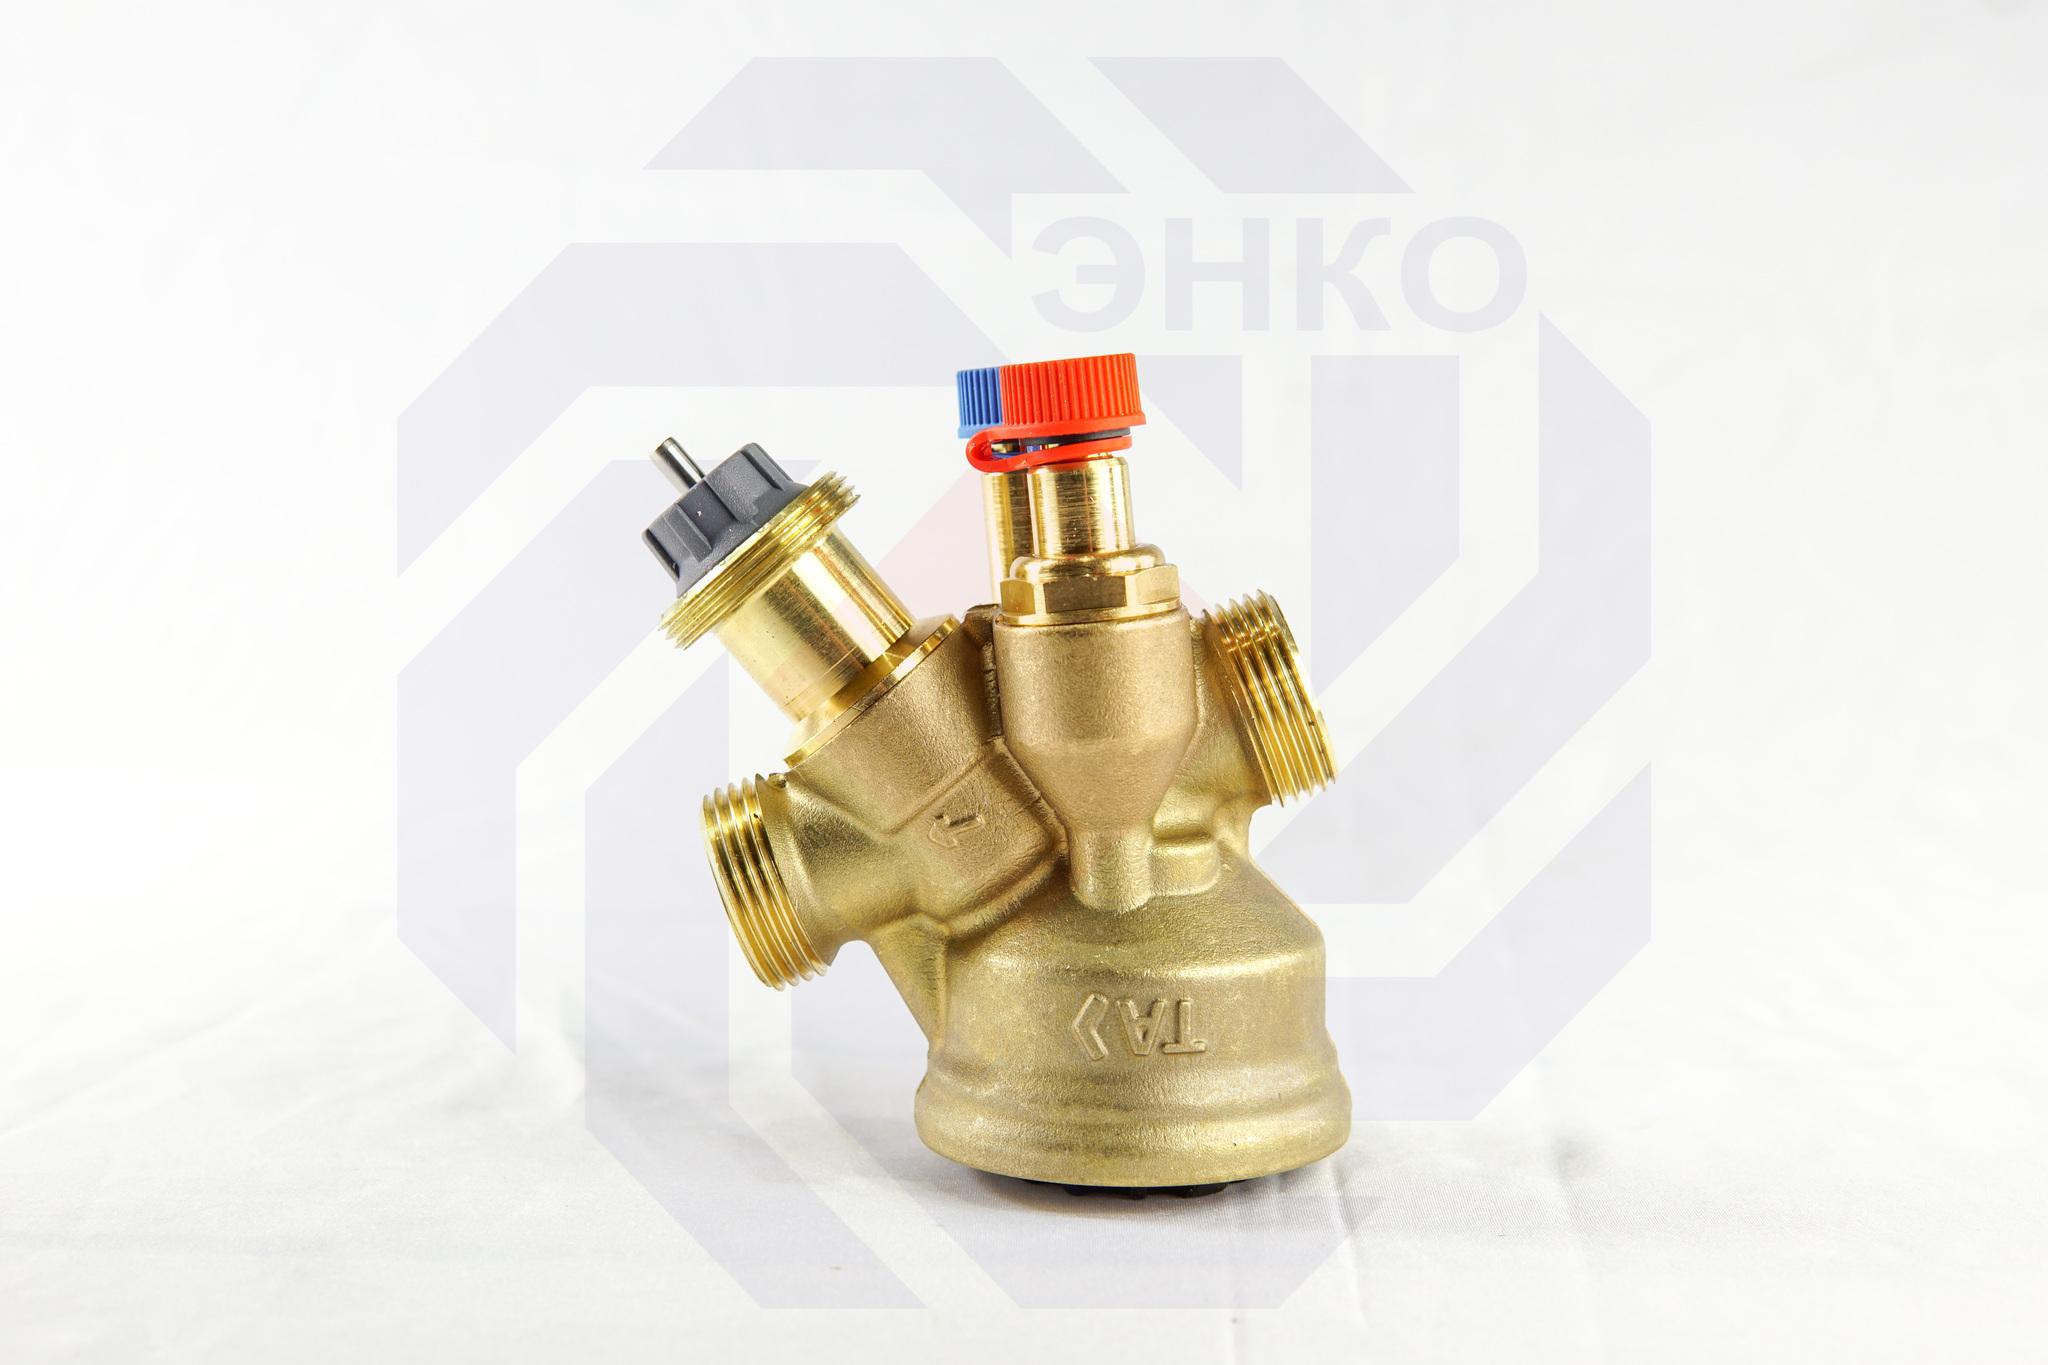 Клапан балансировочный и регулирующий IMI TA-COMPACT-P DN 15